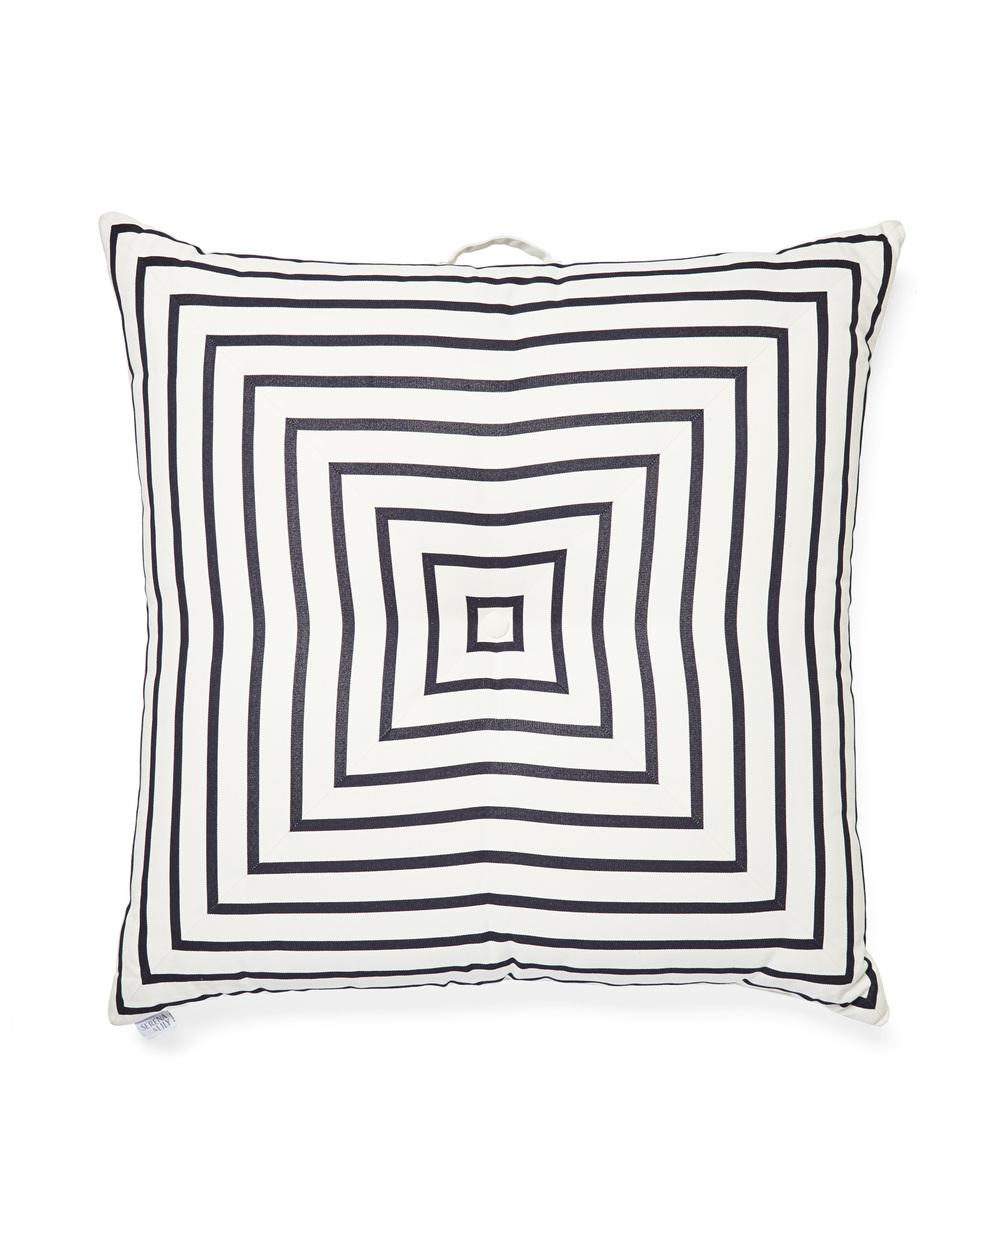 PR_Floor_Pillow_w_Side_Handle_Black_Stripe_MV_Crop_SH.jpg